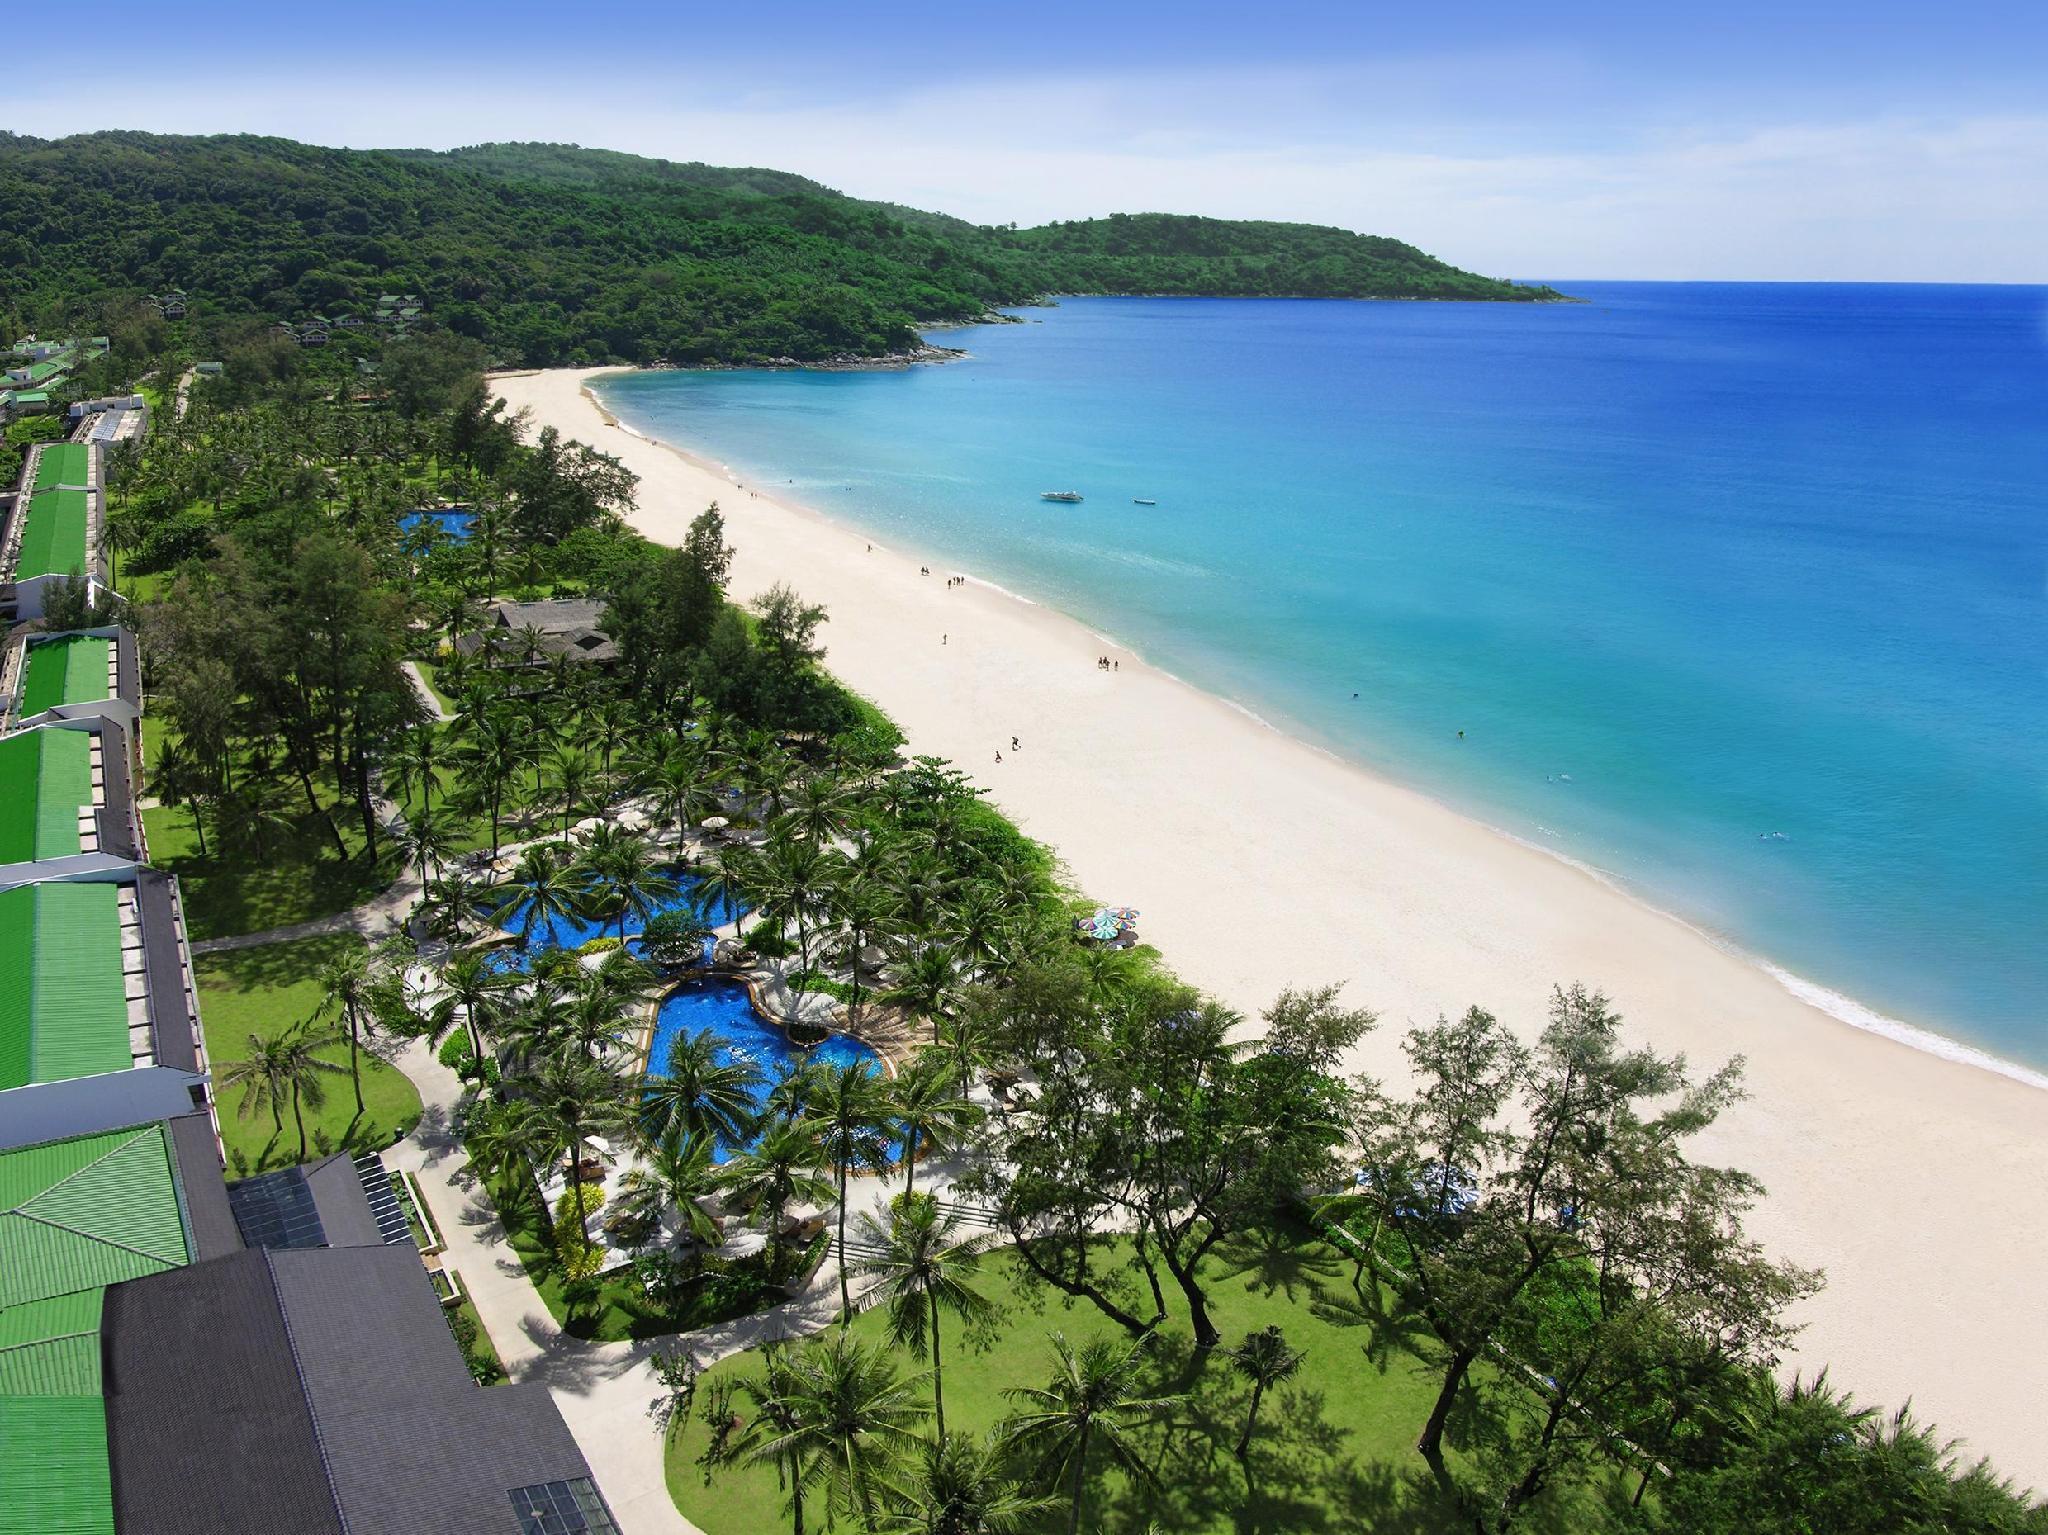 Katathani Phuket Beach Resort กะตะธานี ภูเก็ต บีช รีสอร์ท